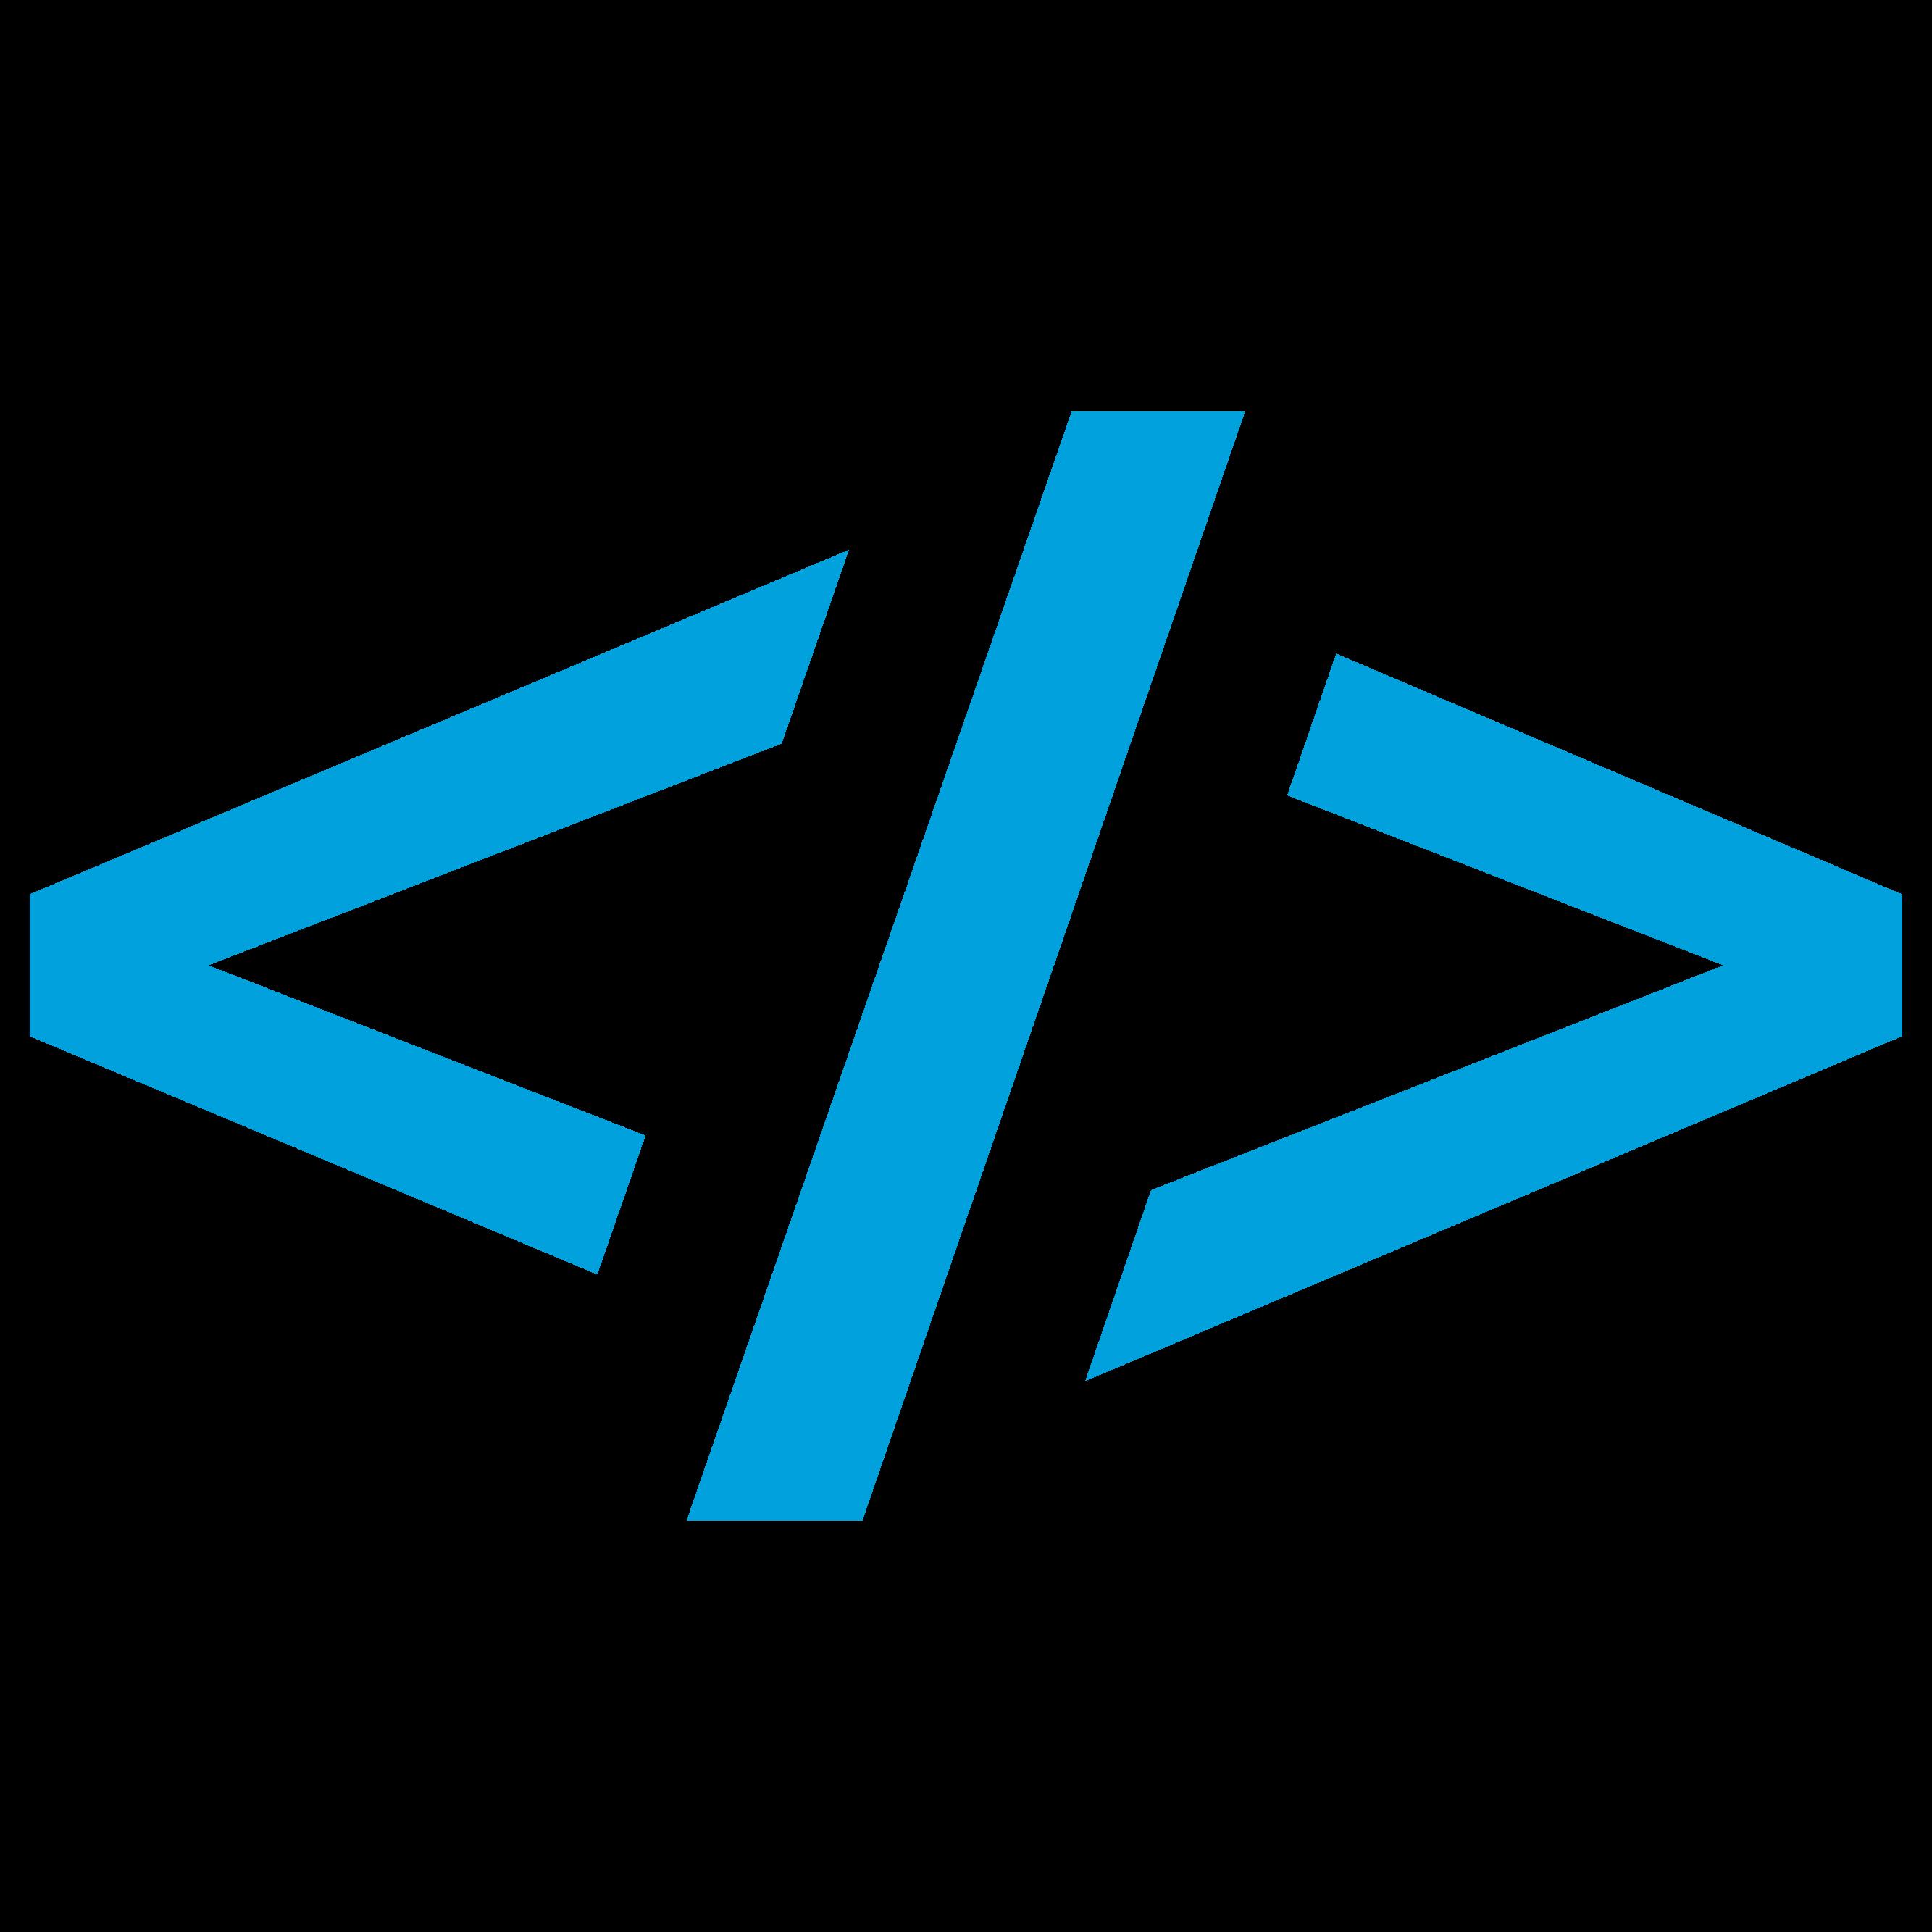 SOAP Web Service Security icon